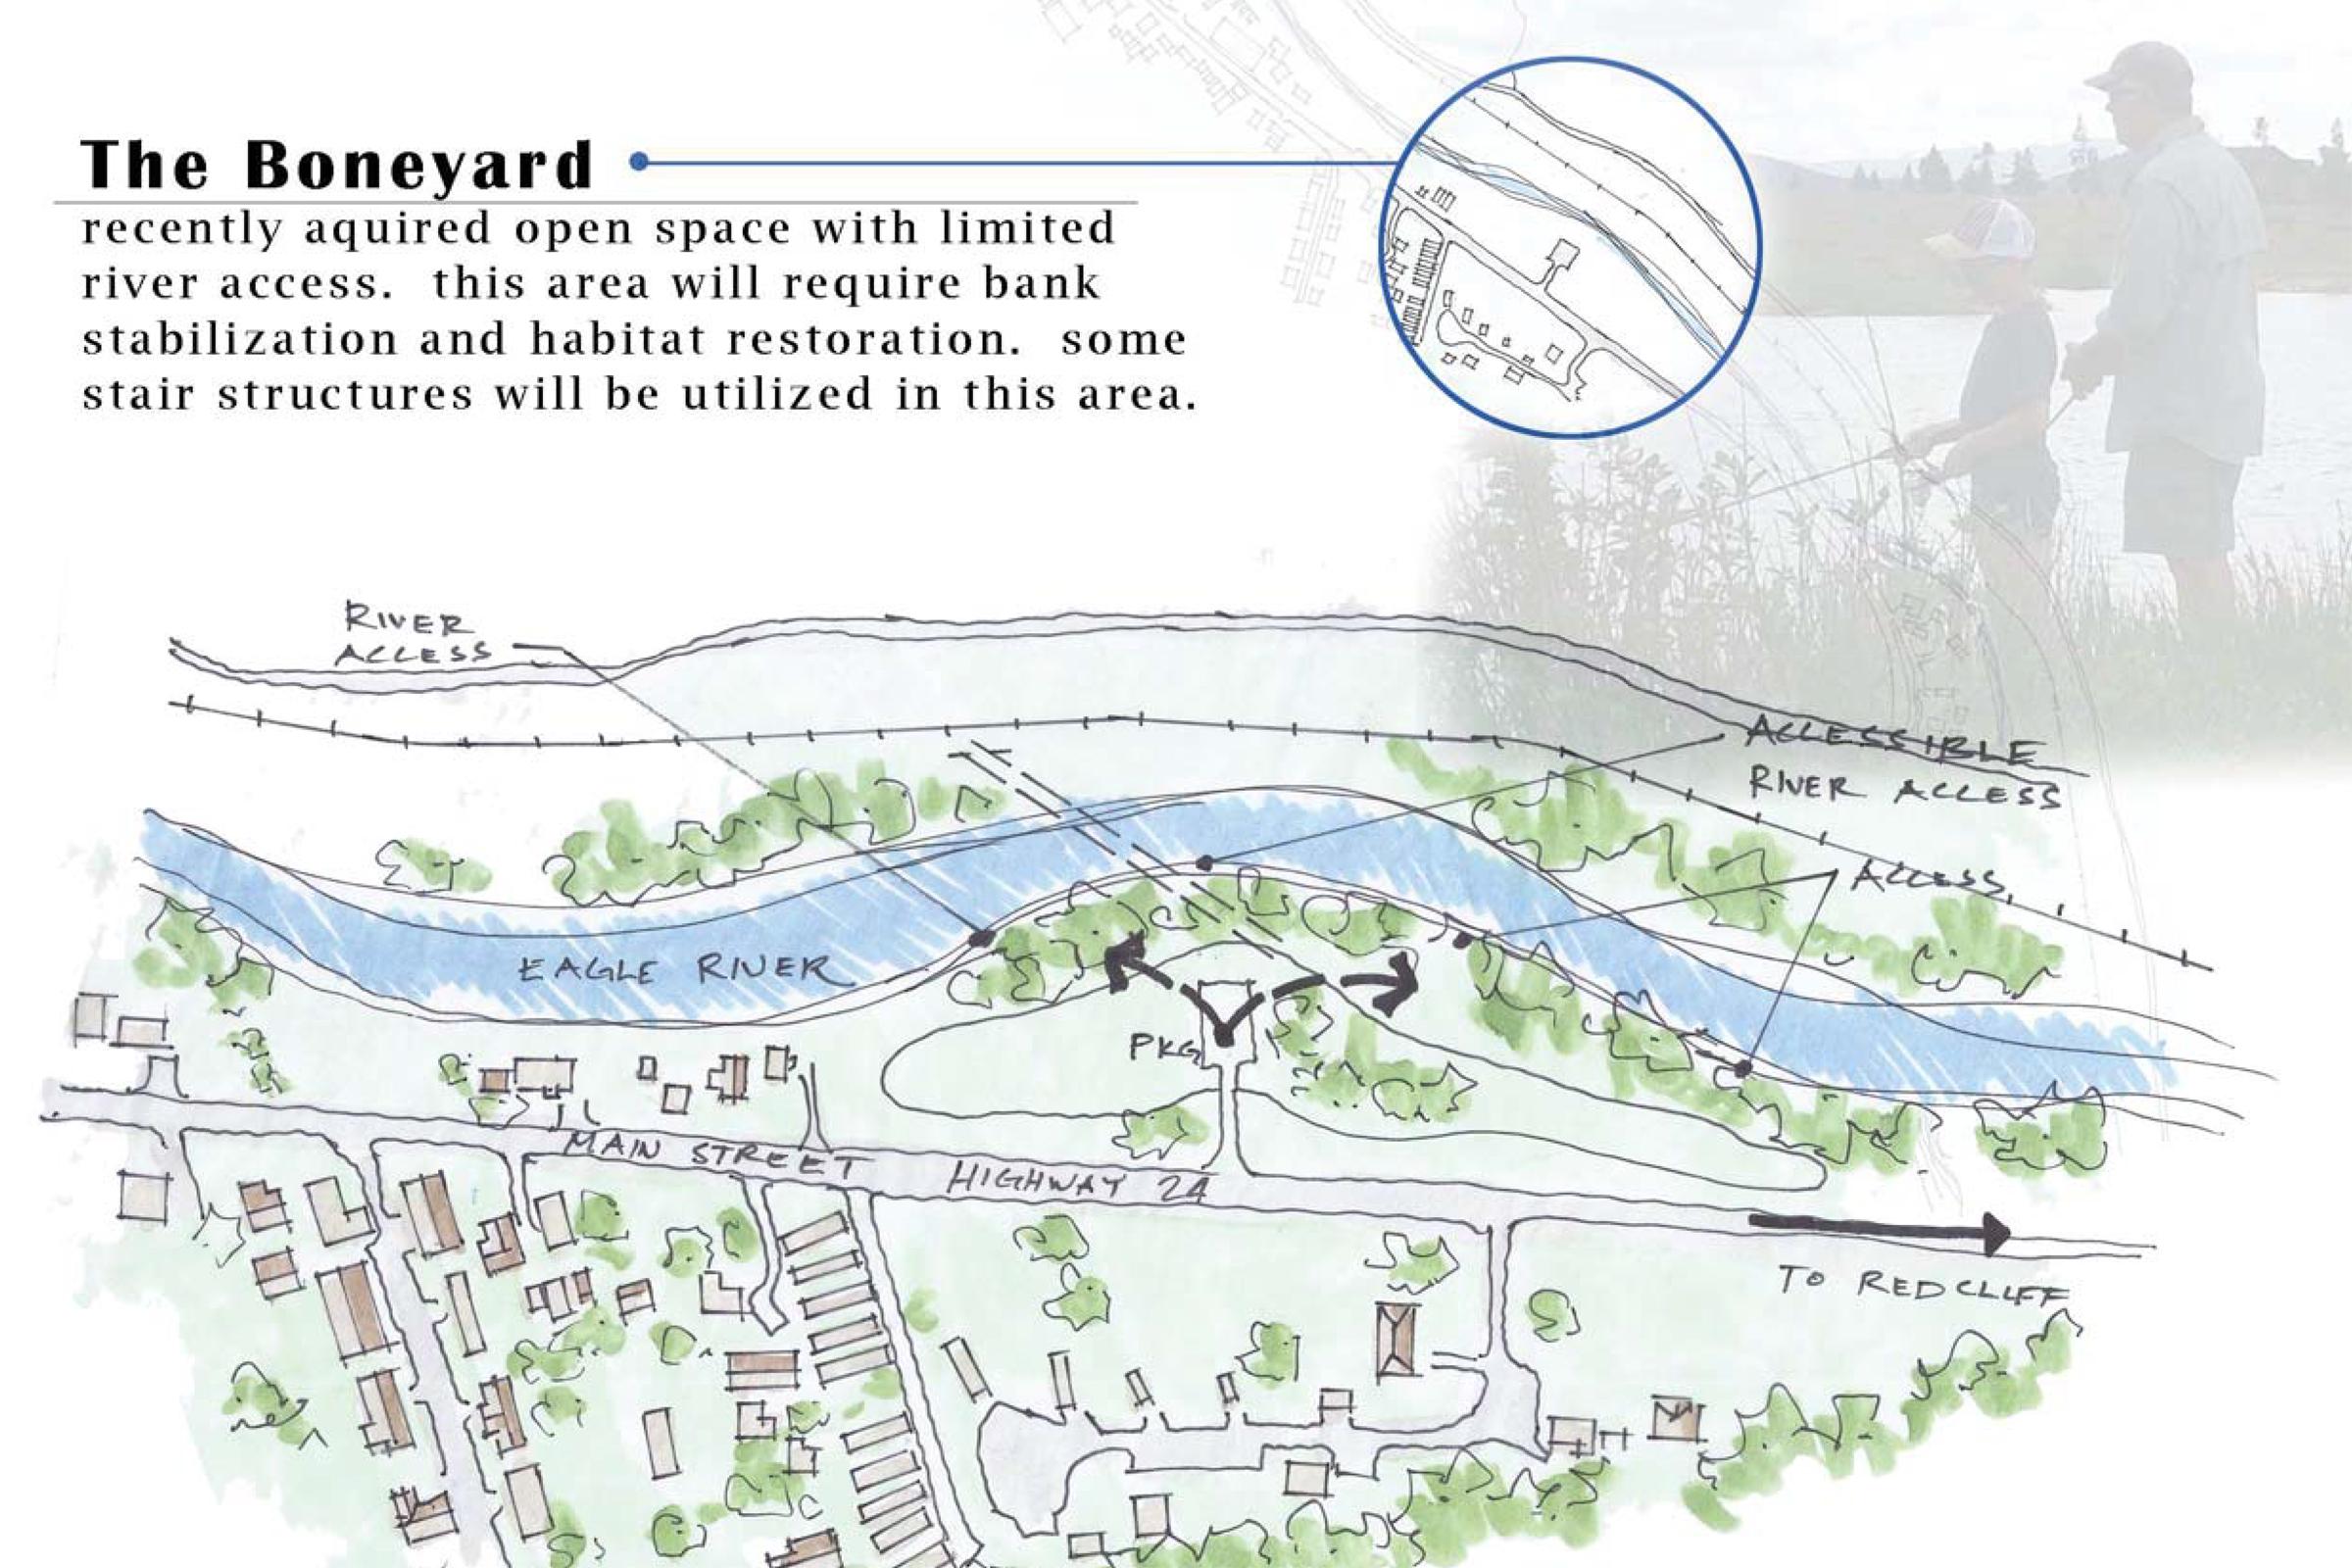 The Boneyard Concept Plan